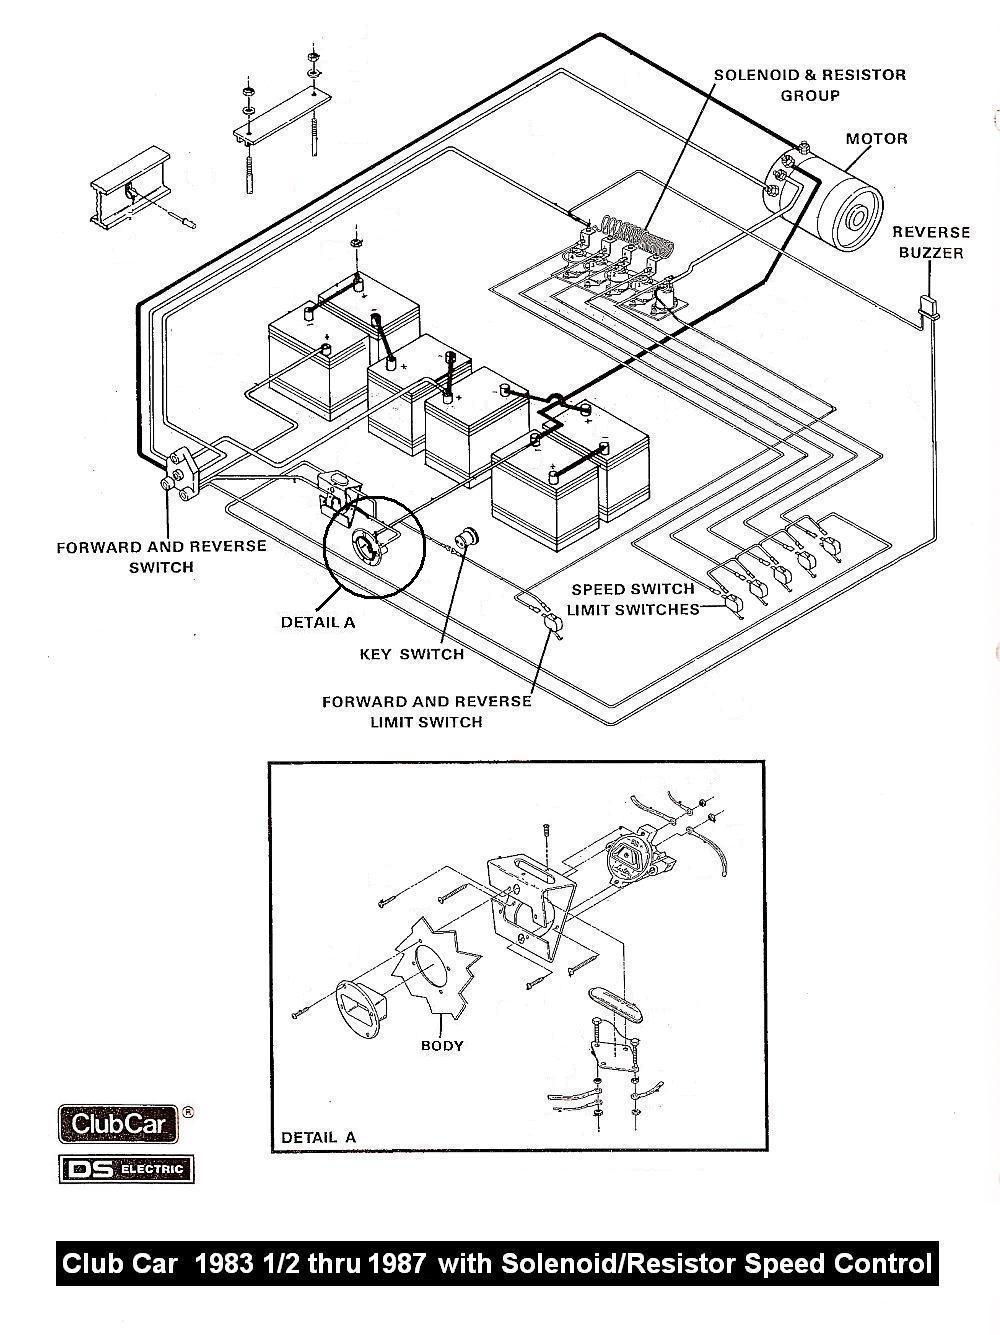 CC_83_87_solenoid_wiring?resize\\\\\\\=665%2C888 gem e825 battery wiring diagram gem e2 wiring diagrams, gem car gem e2 wiring diagram at reclaimingppi.co